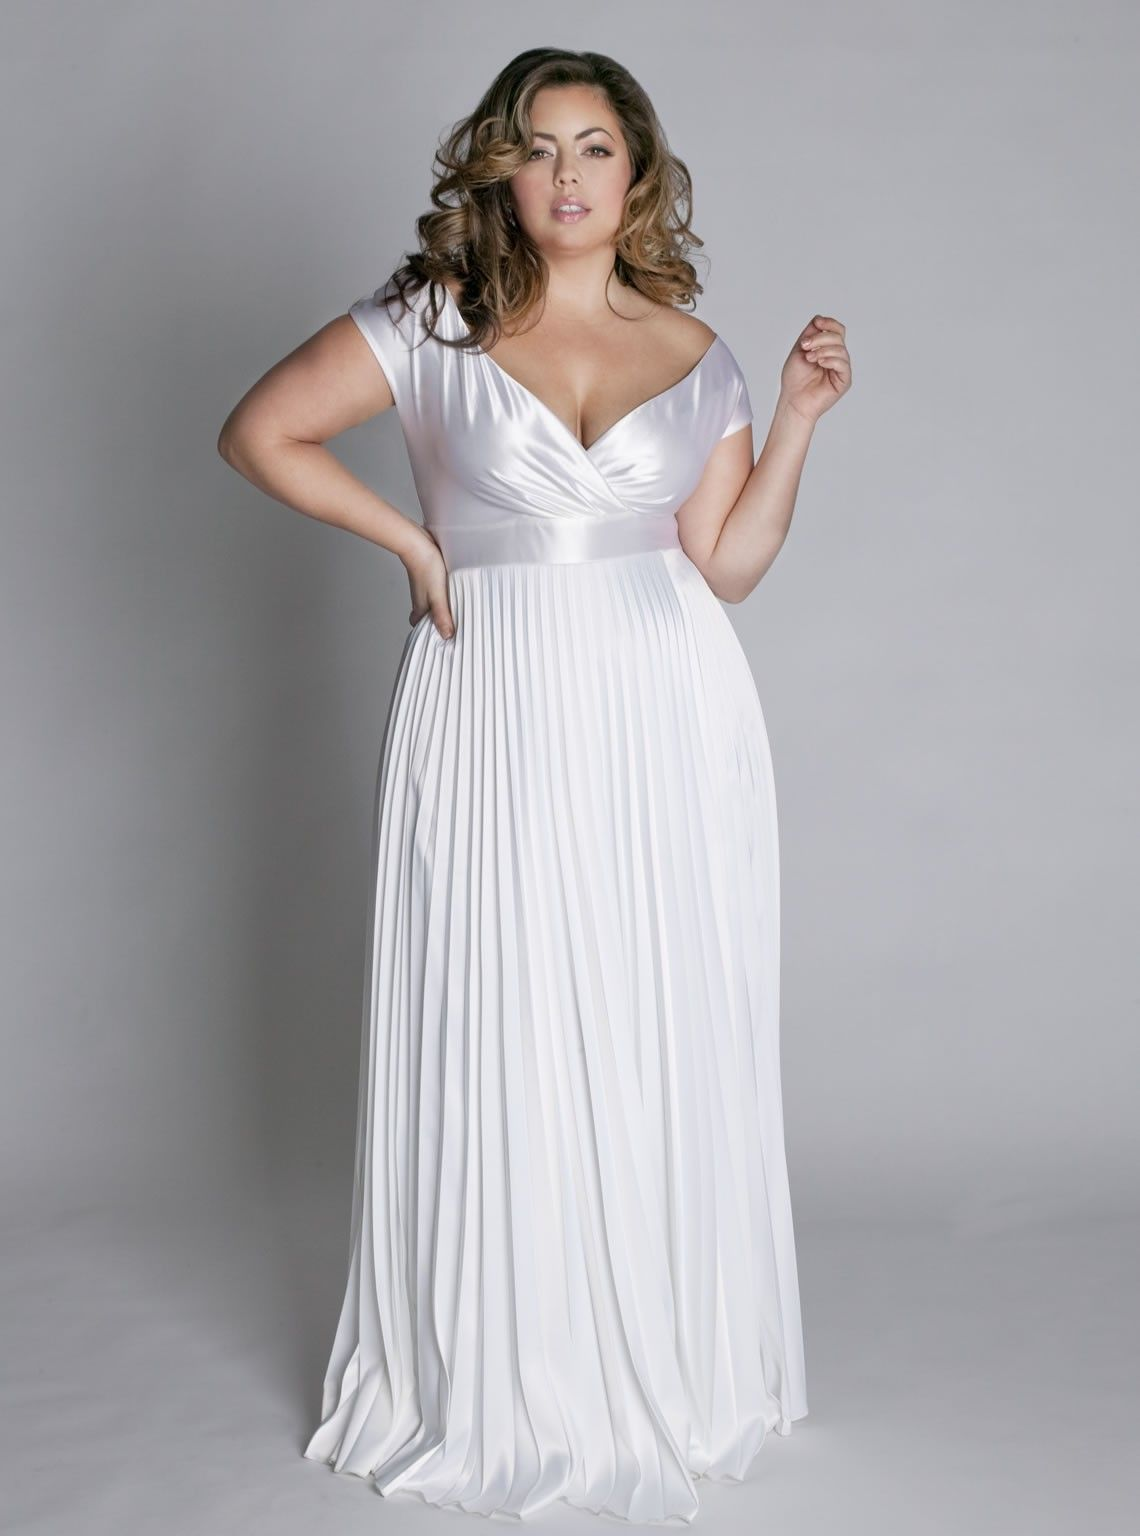 Curvy Bride | Trajes novia talla grande | Pinterest | Girl blog ...